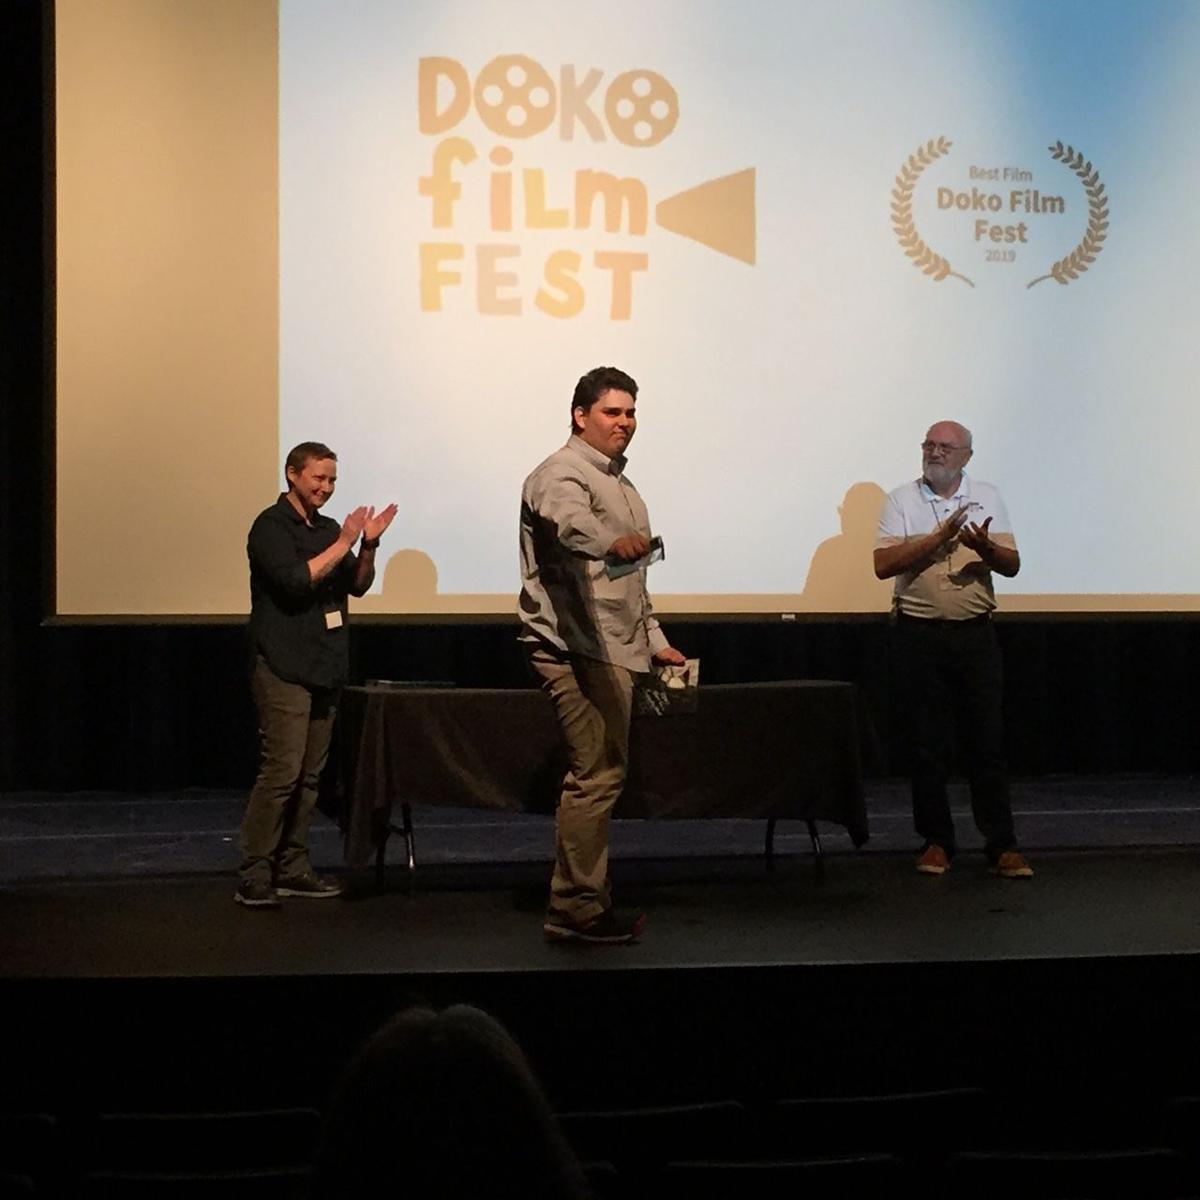 Luke Evans accepts his Best Film award